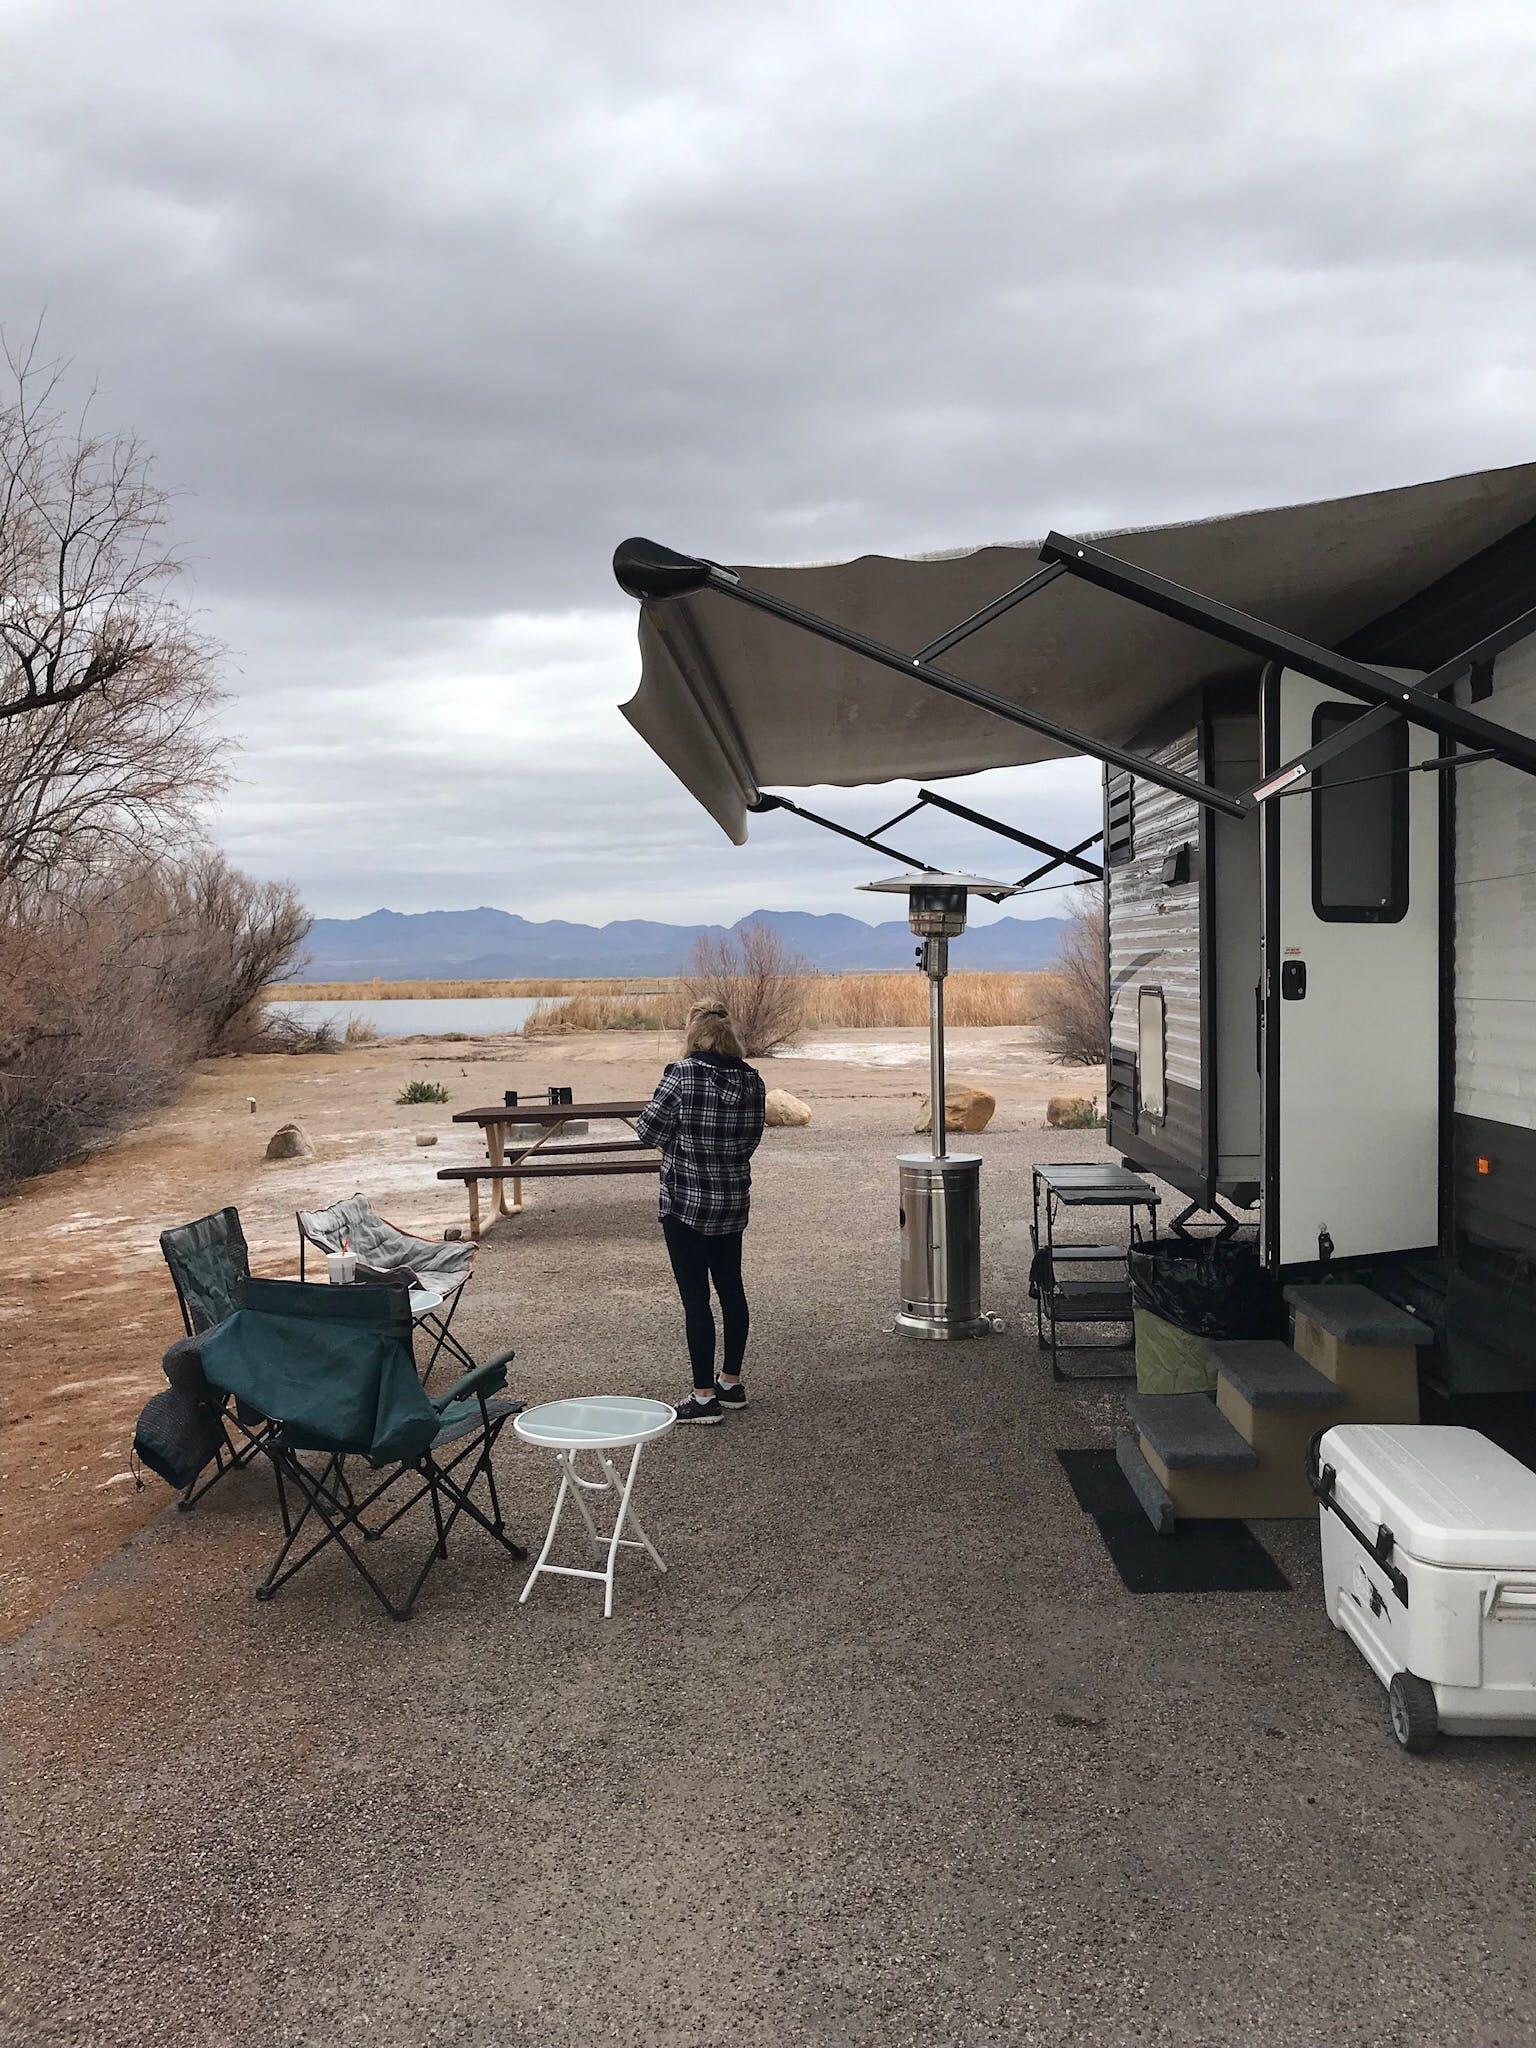 Roper Lake State Park, AZ | The Dyrt